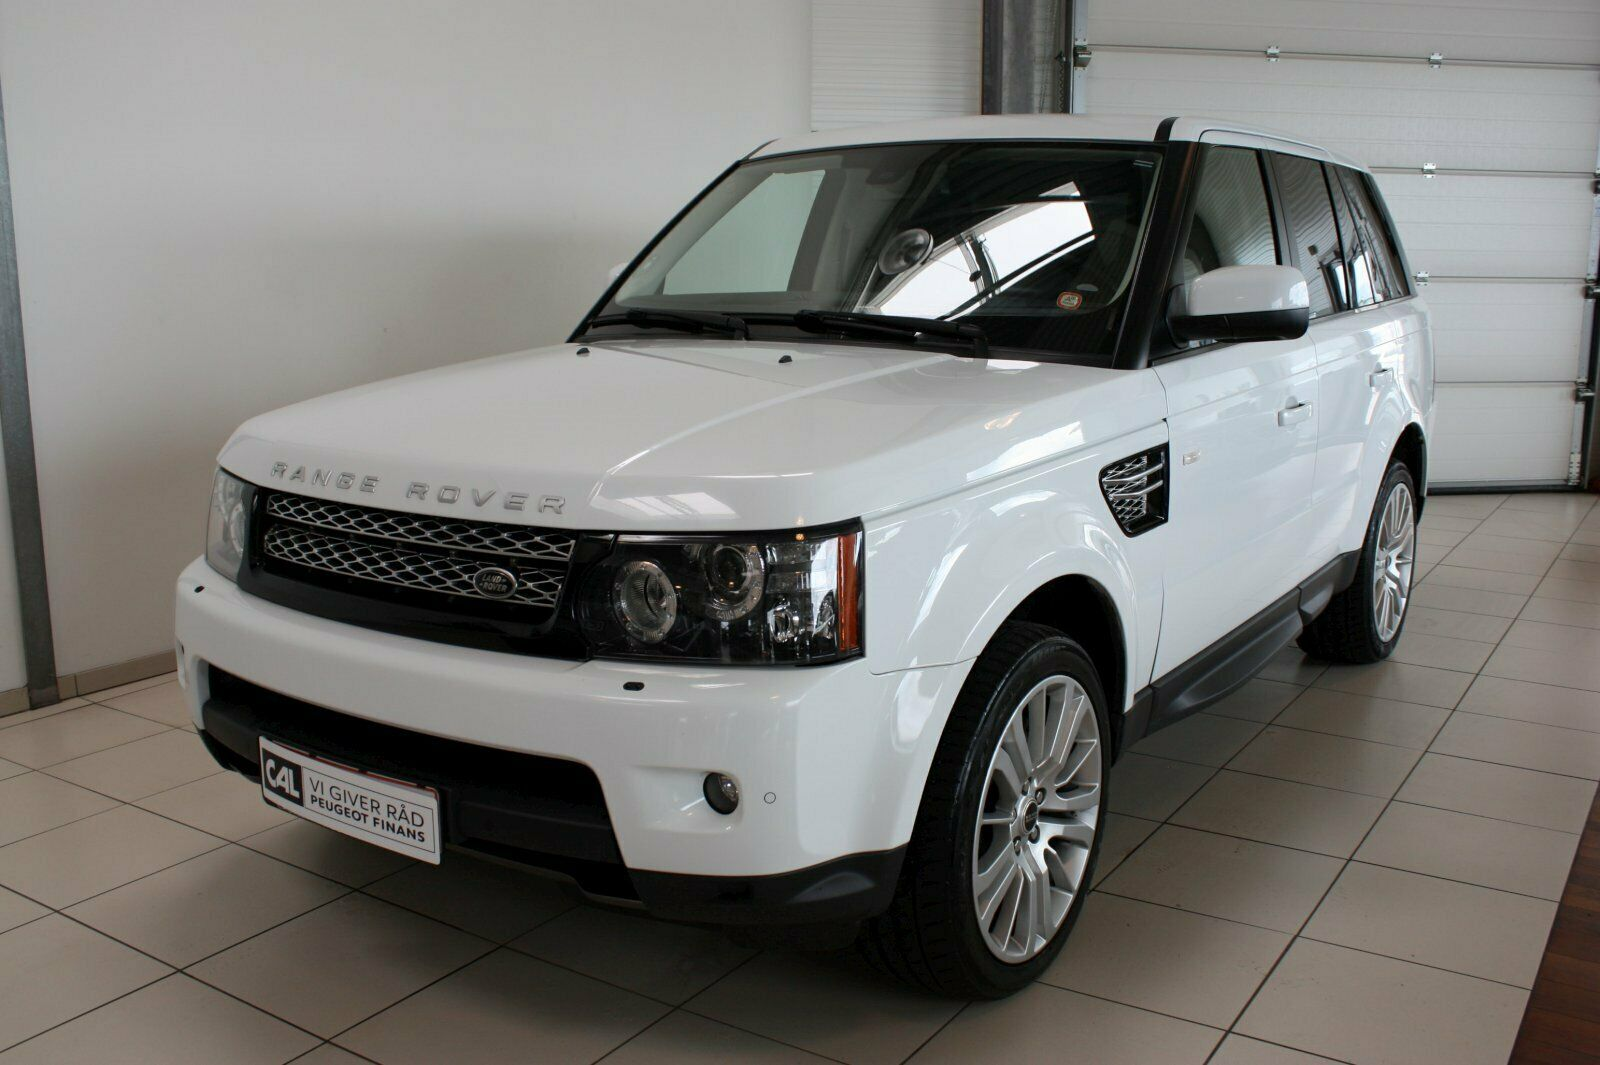 Land Rover Range Rover Sport 3,0 SDV6 SE aut. 5d - 429.900 kr.